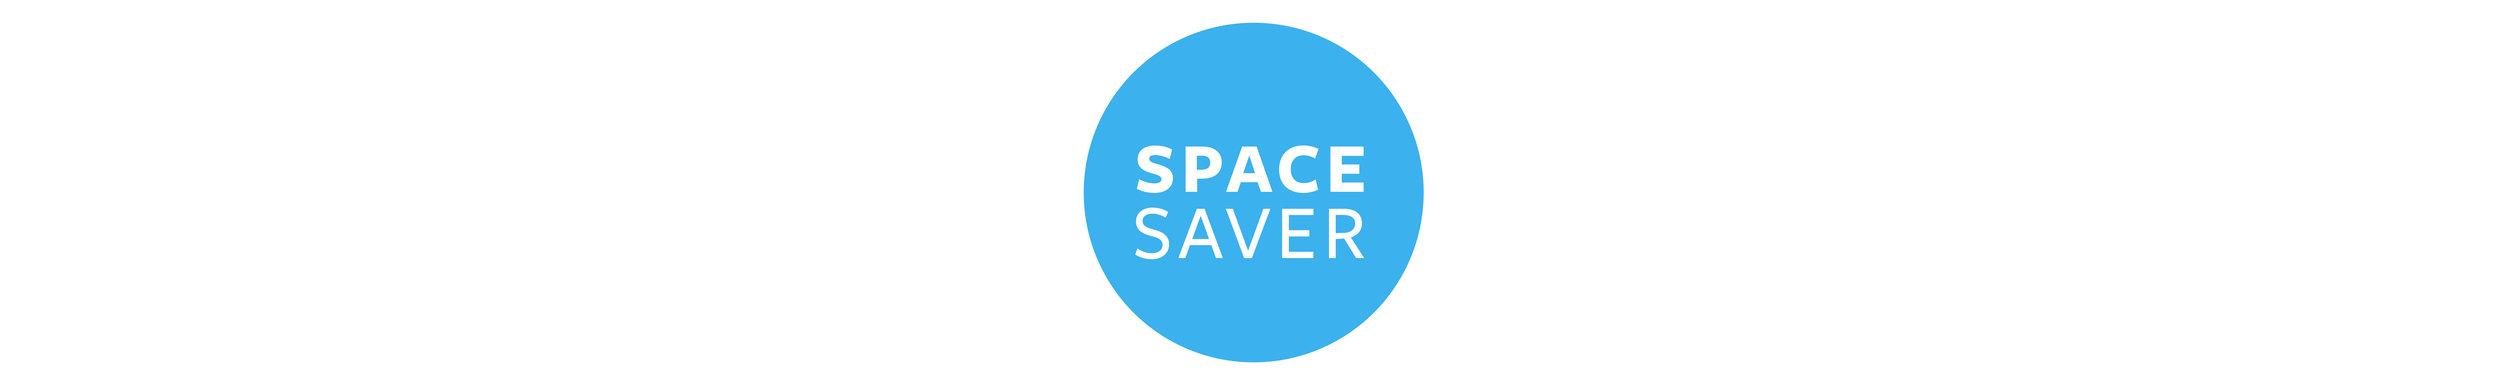 SPACE SAVER.jpg